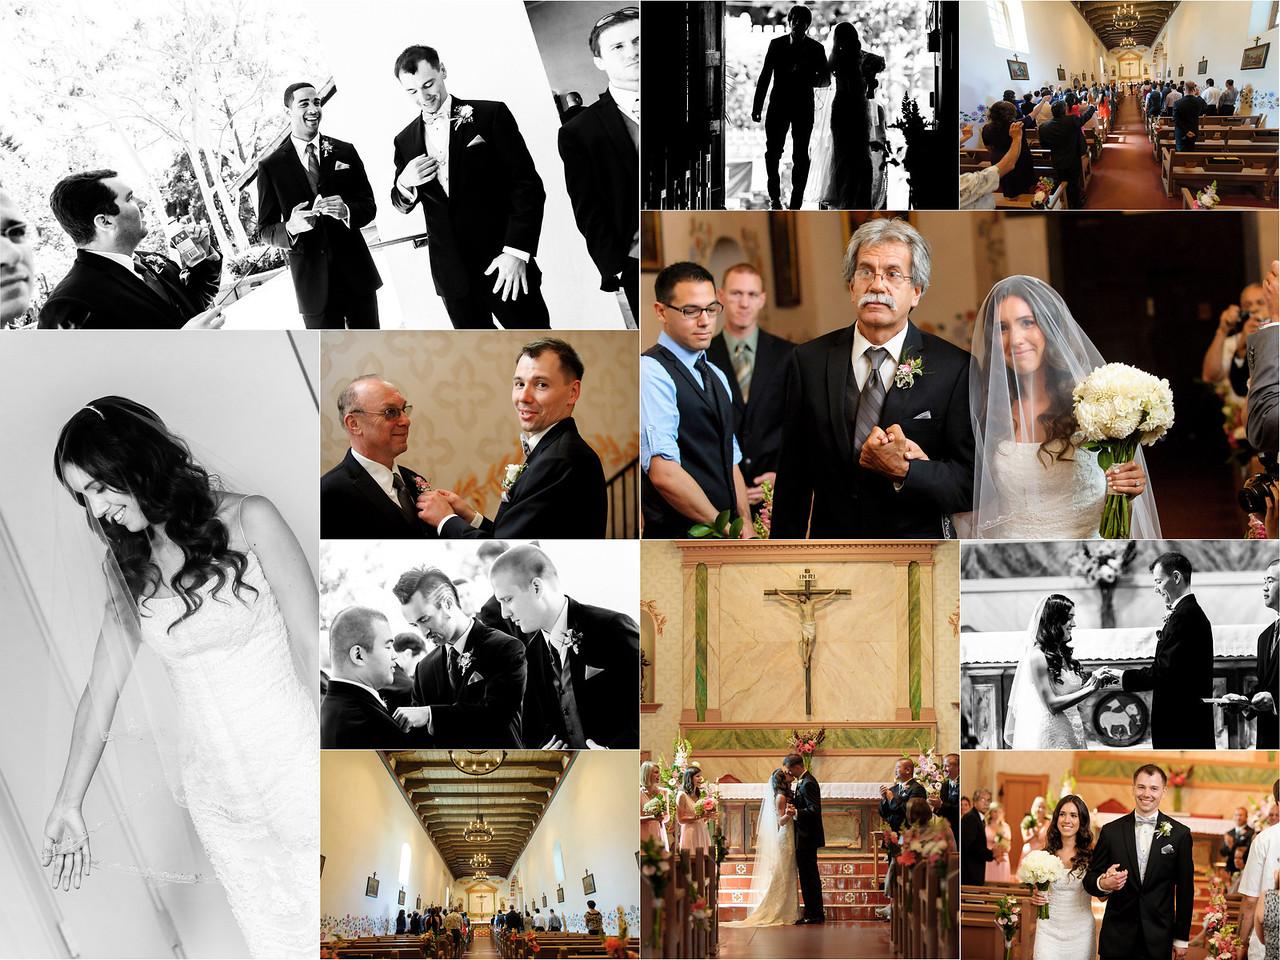 Jenny_and_Dimitriy_Wedding_Photography_4x6_Photo_Board_03